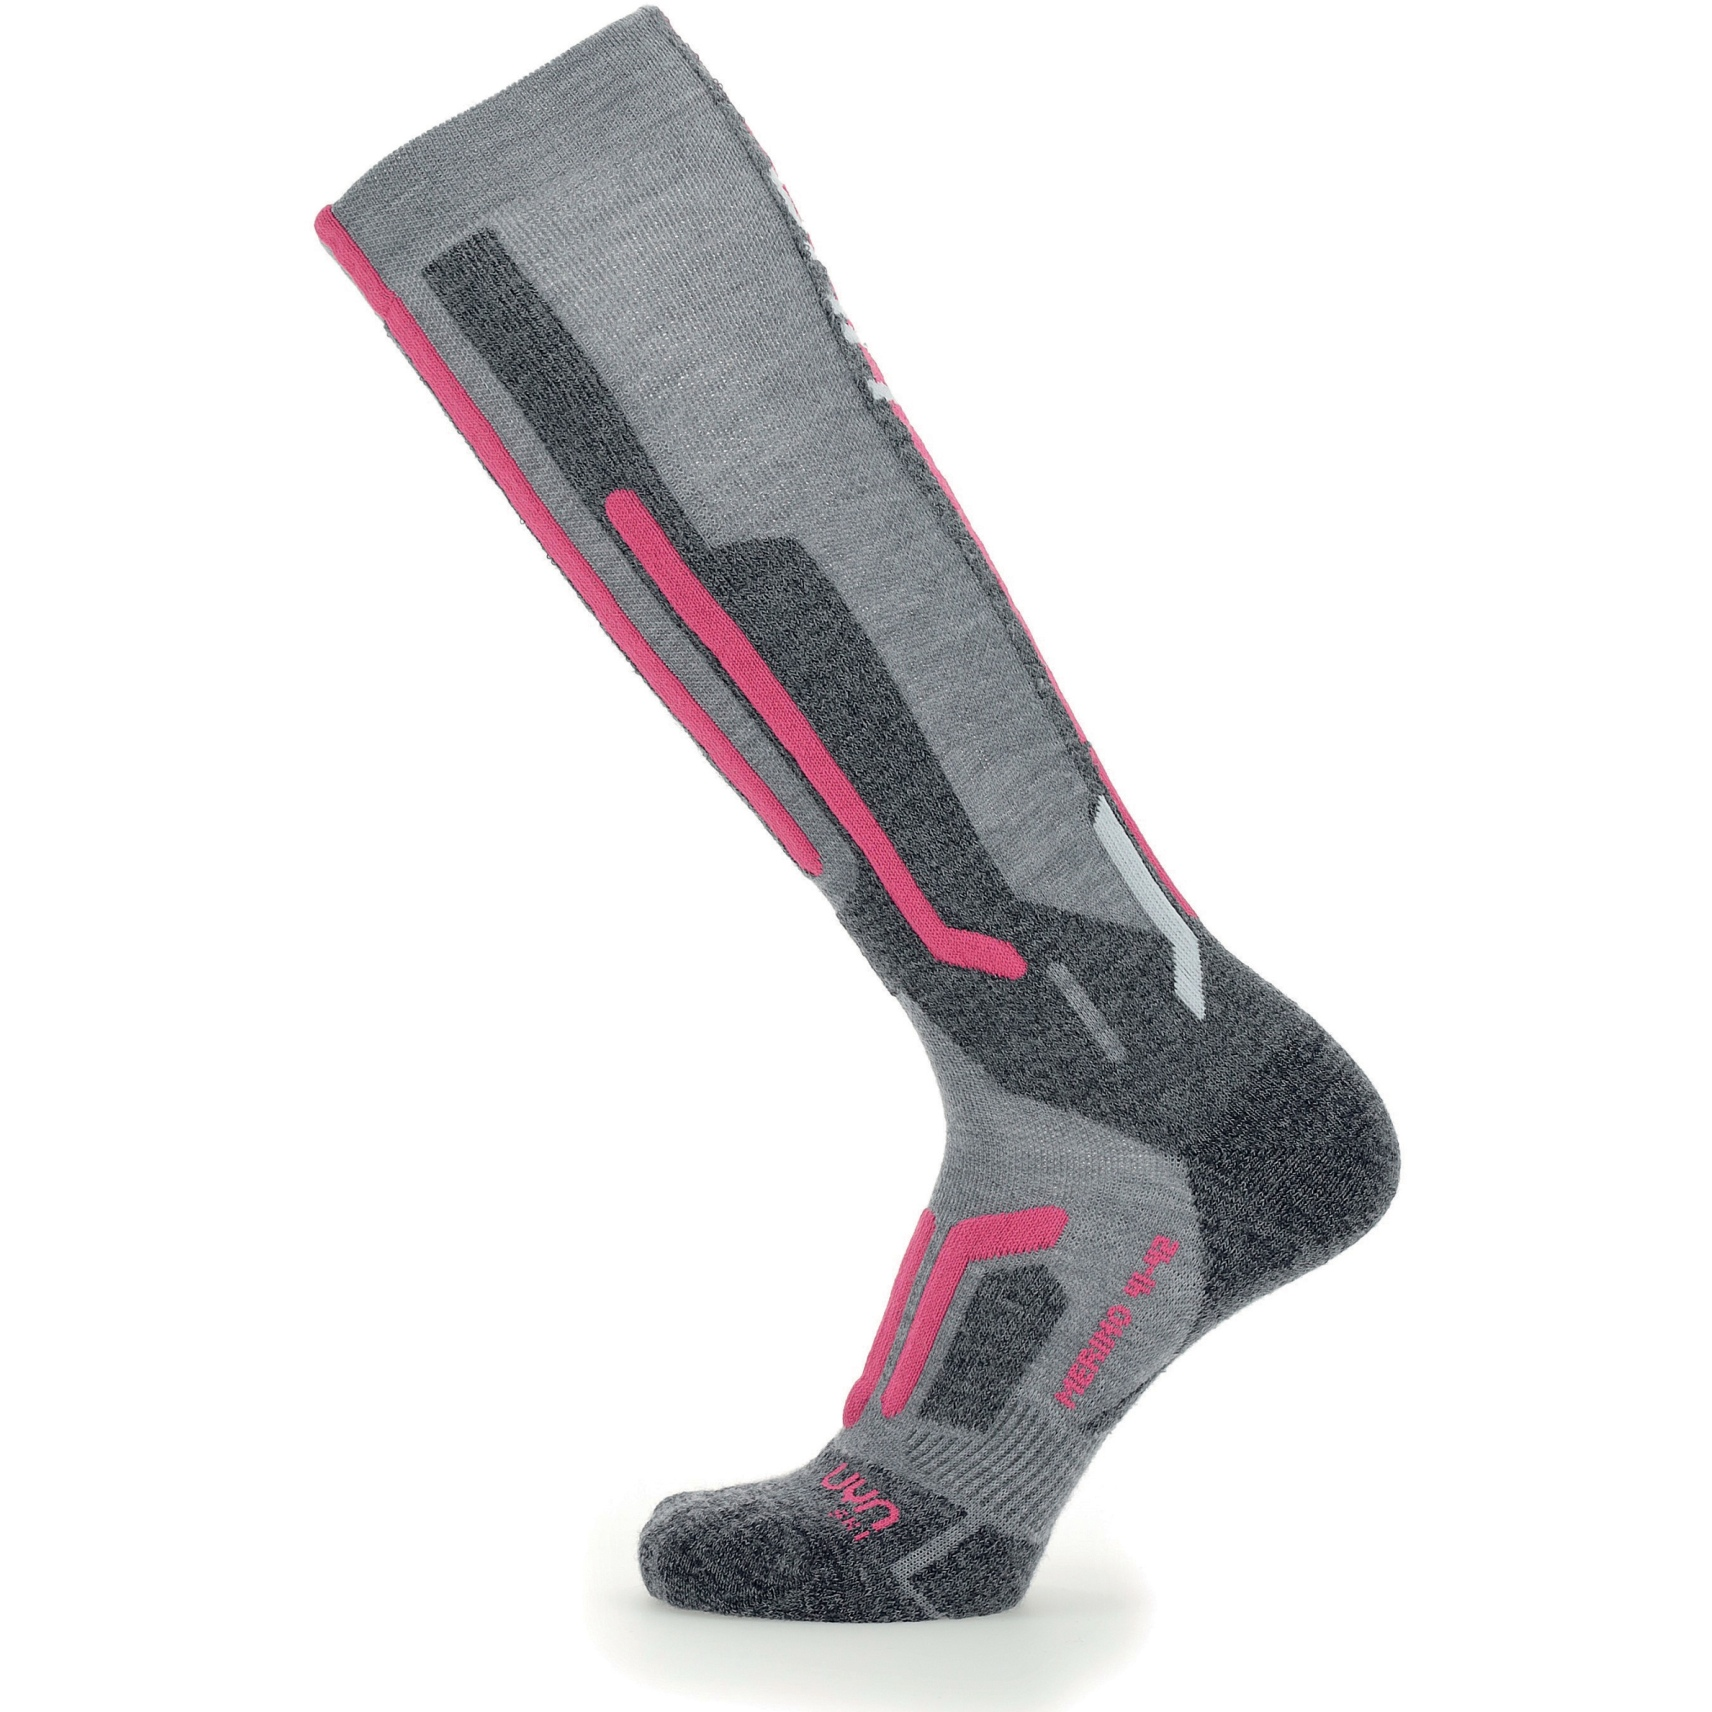 Bild von UYN Ski Merino Socken Damen - Light Grey/Pink